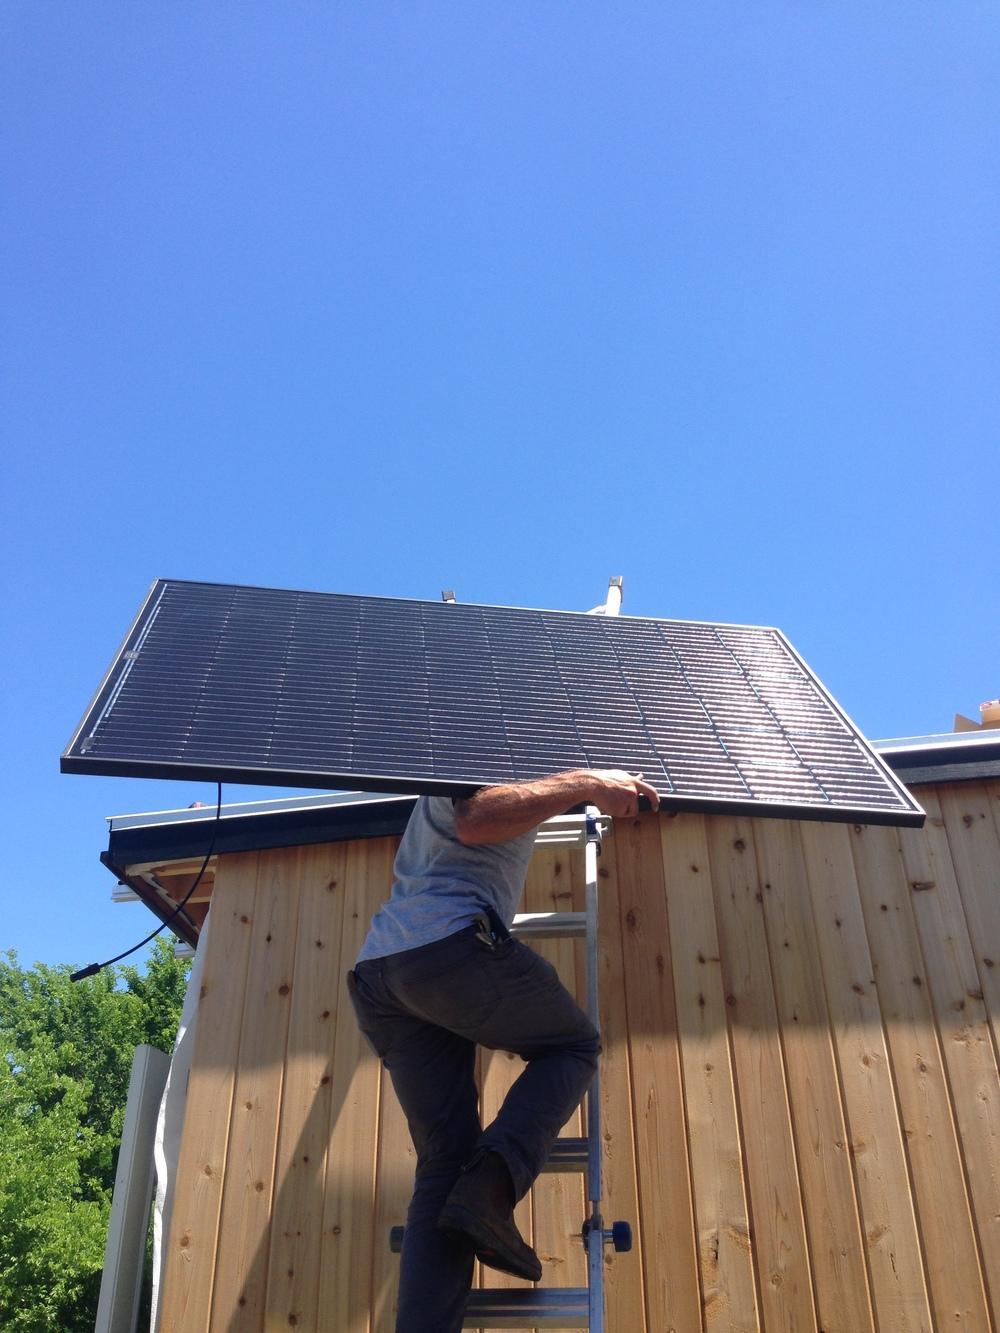 tiny-house-solar-panel-installation-earth-day-2016-2